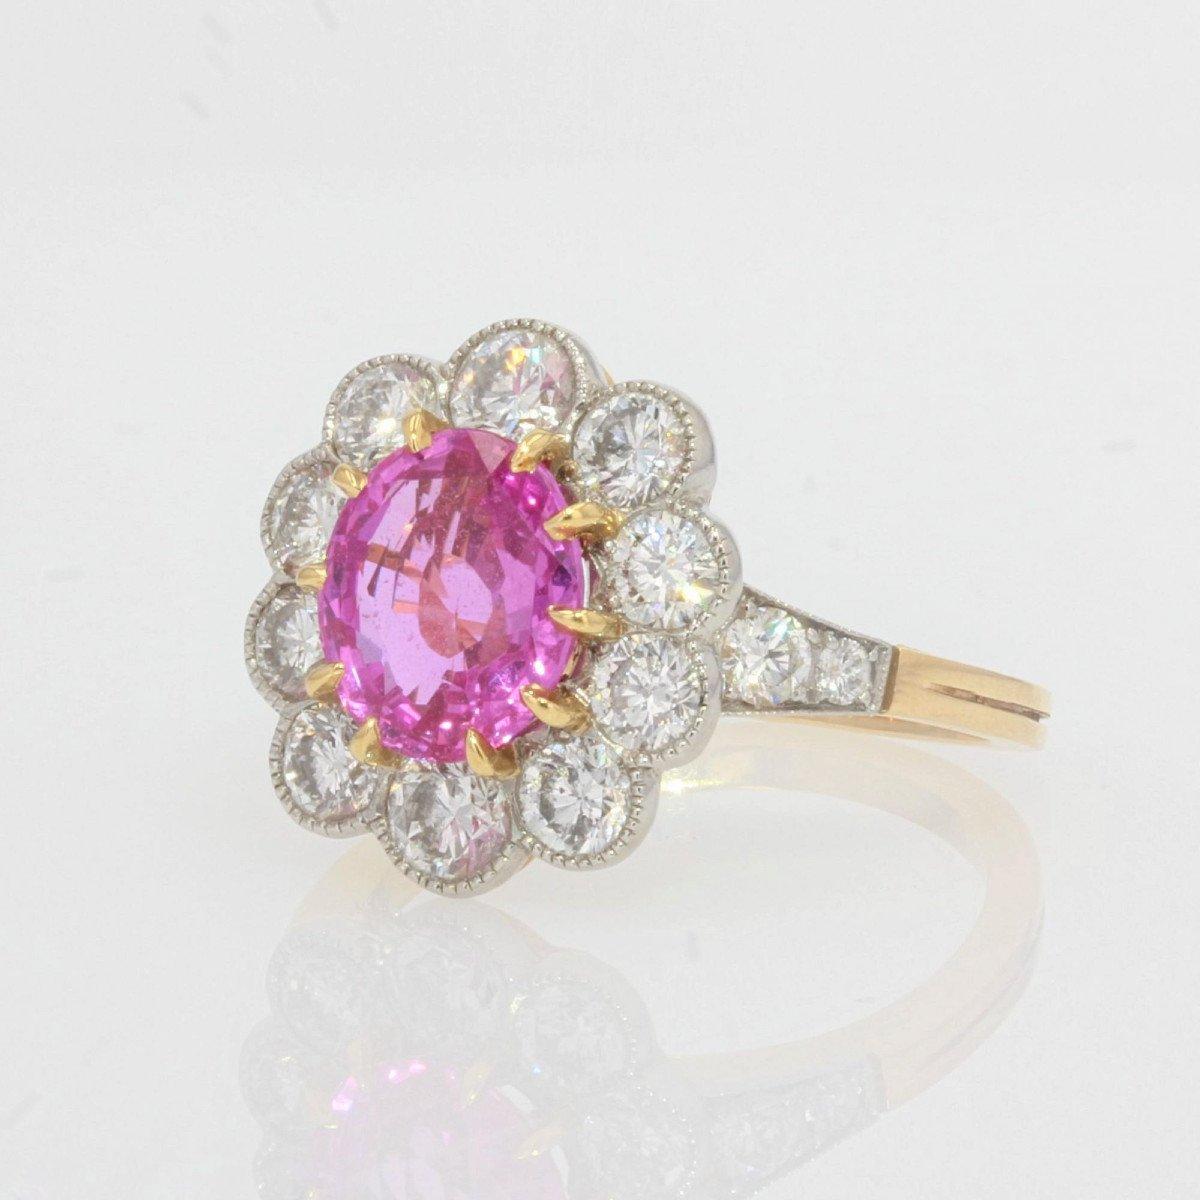 Bague Marguerite Saphir Rose Diamants Or Platine-photo-2